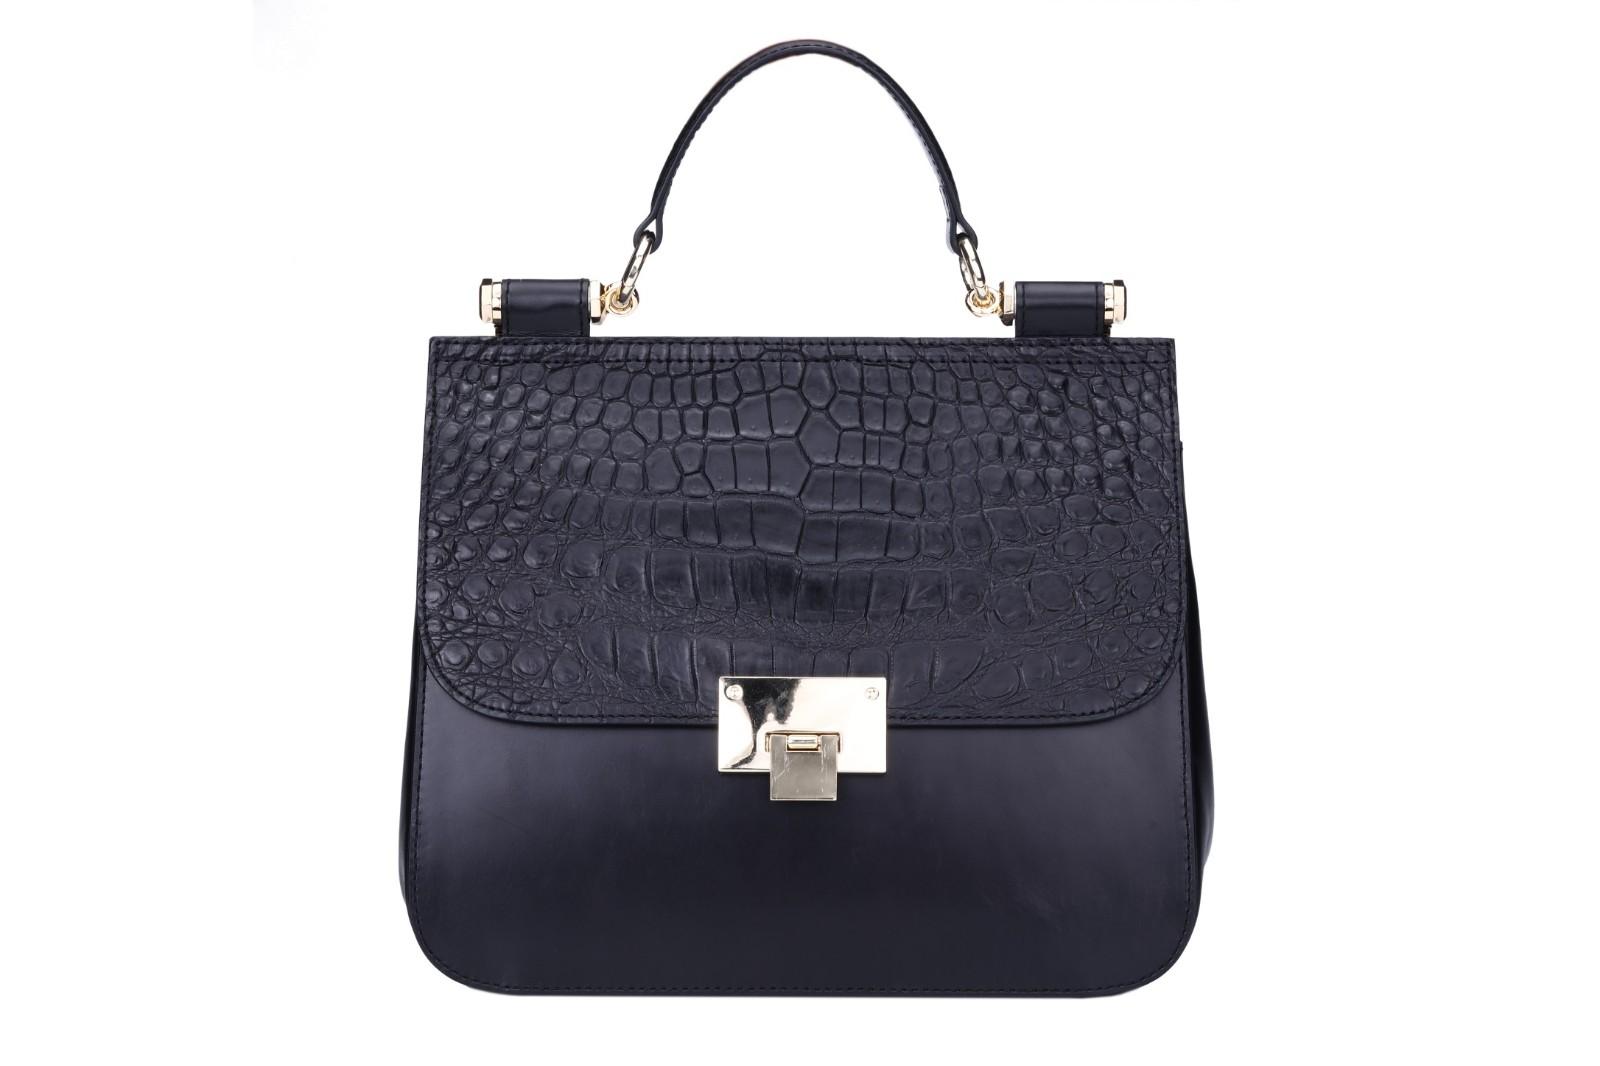 GF bags-Professional Ladies Bag Affordable Handbags From Gaofeng Bags-4